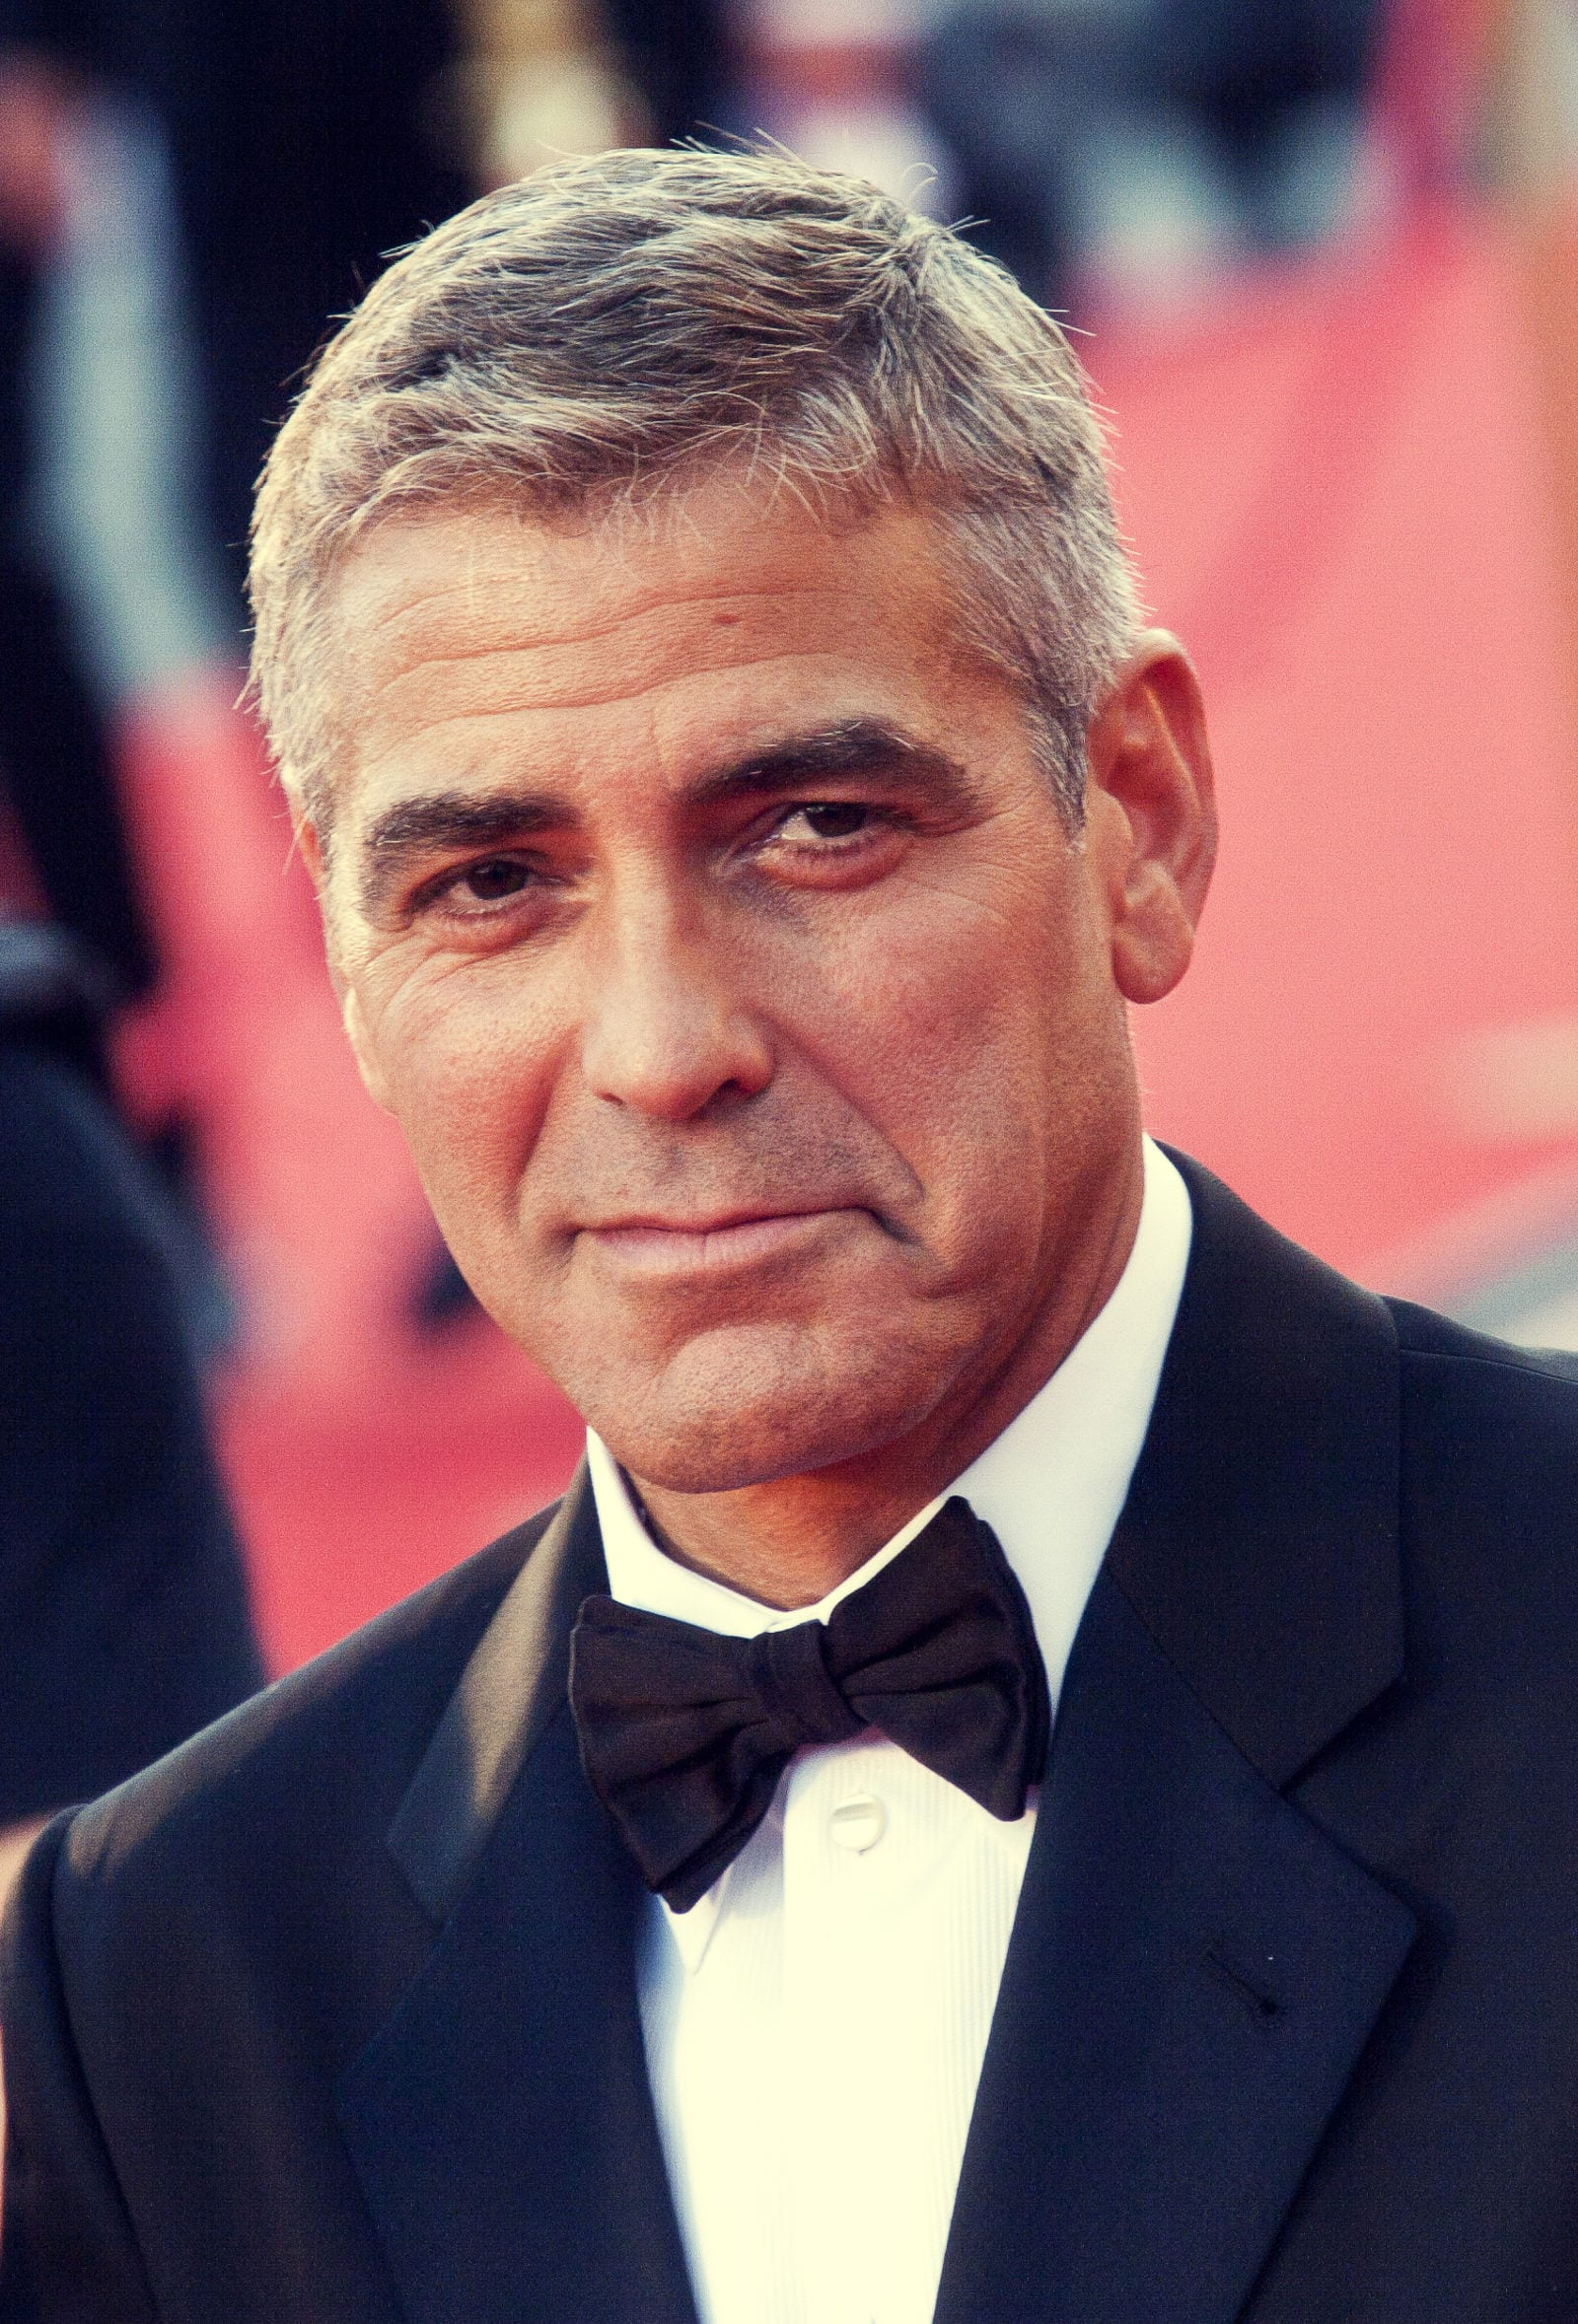 George Clooney's Caeasar haircut